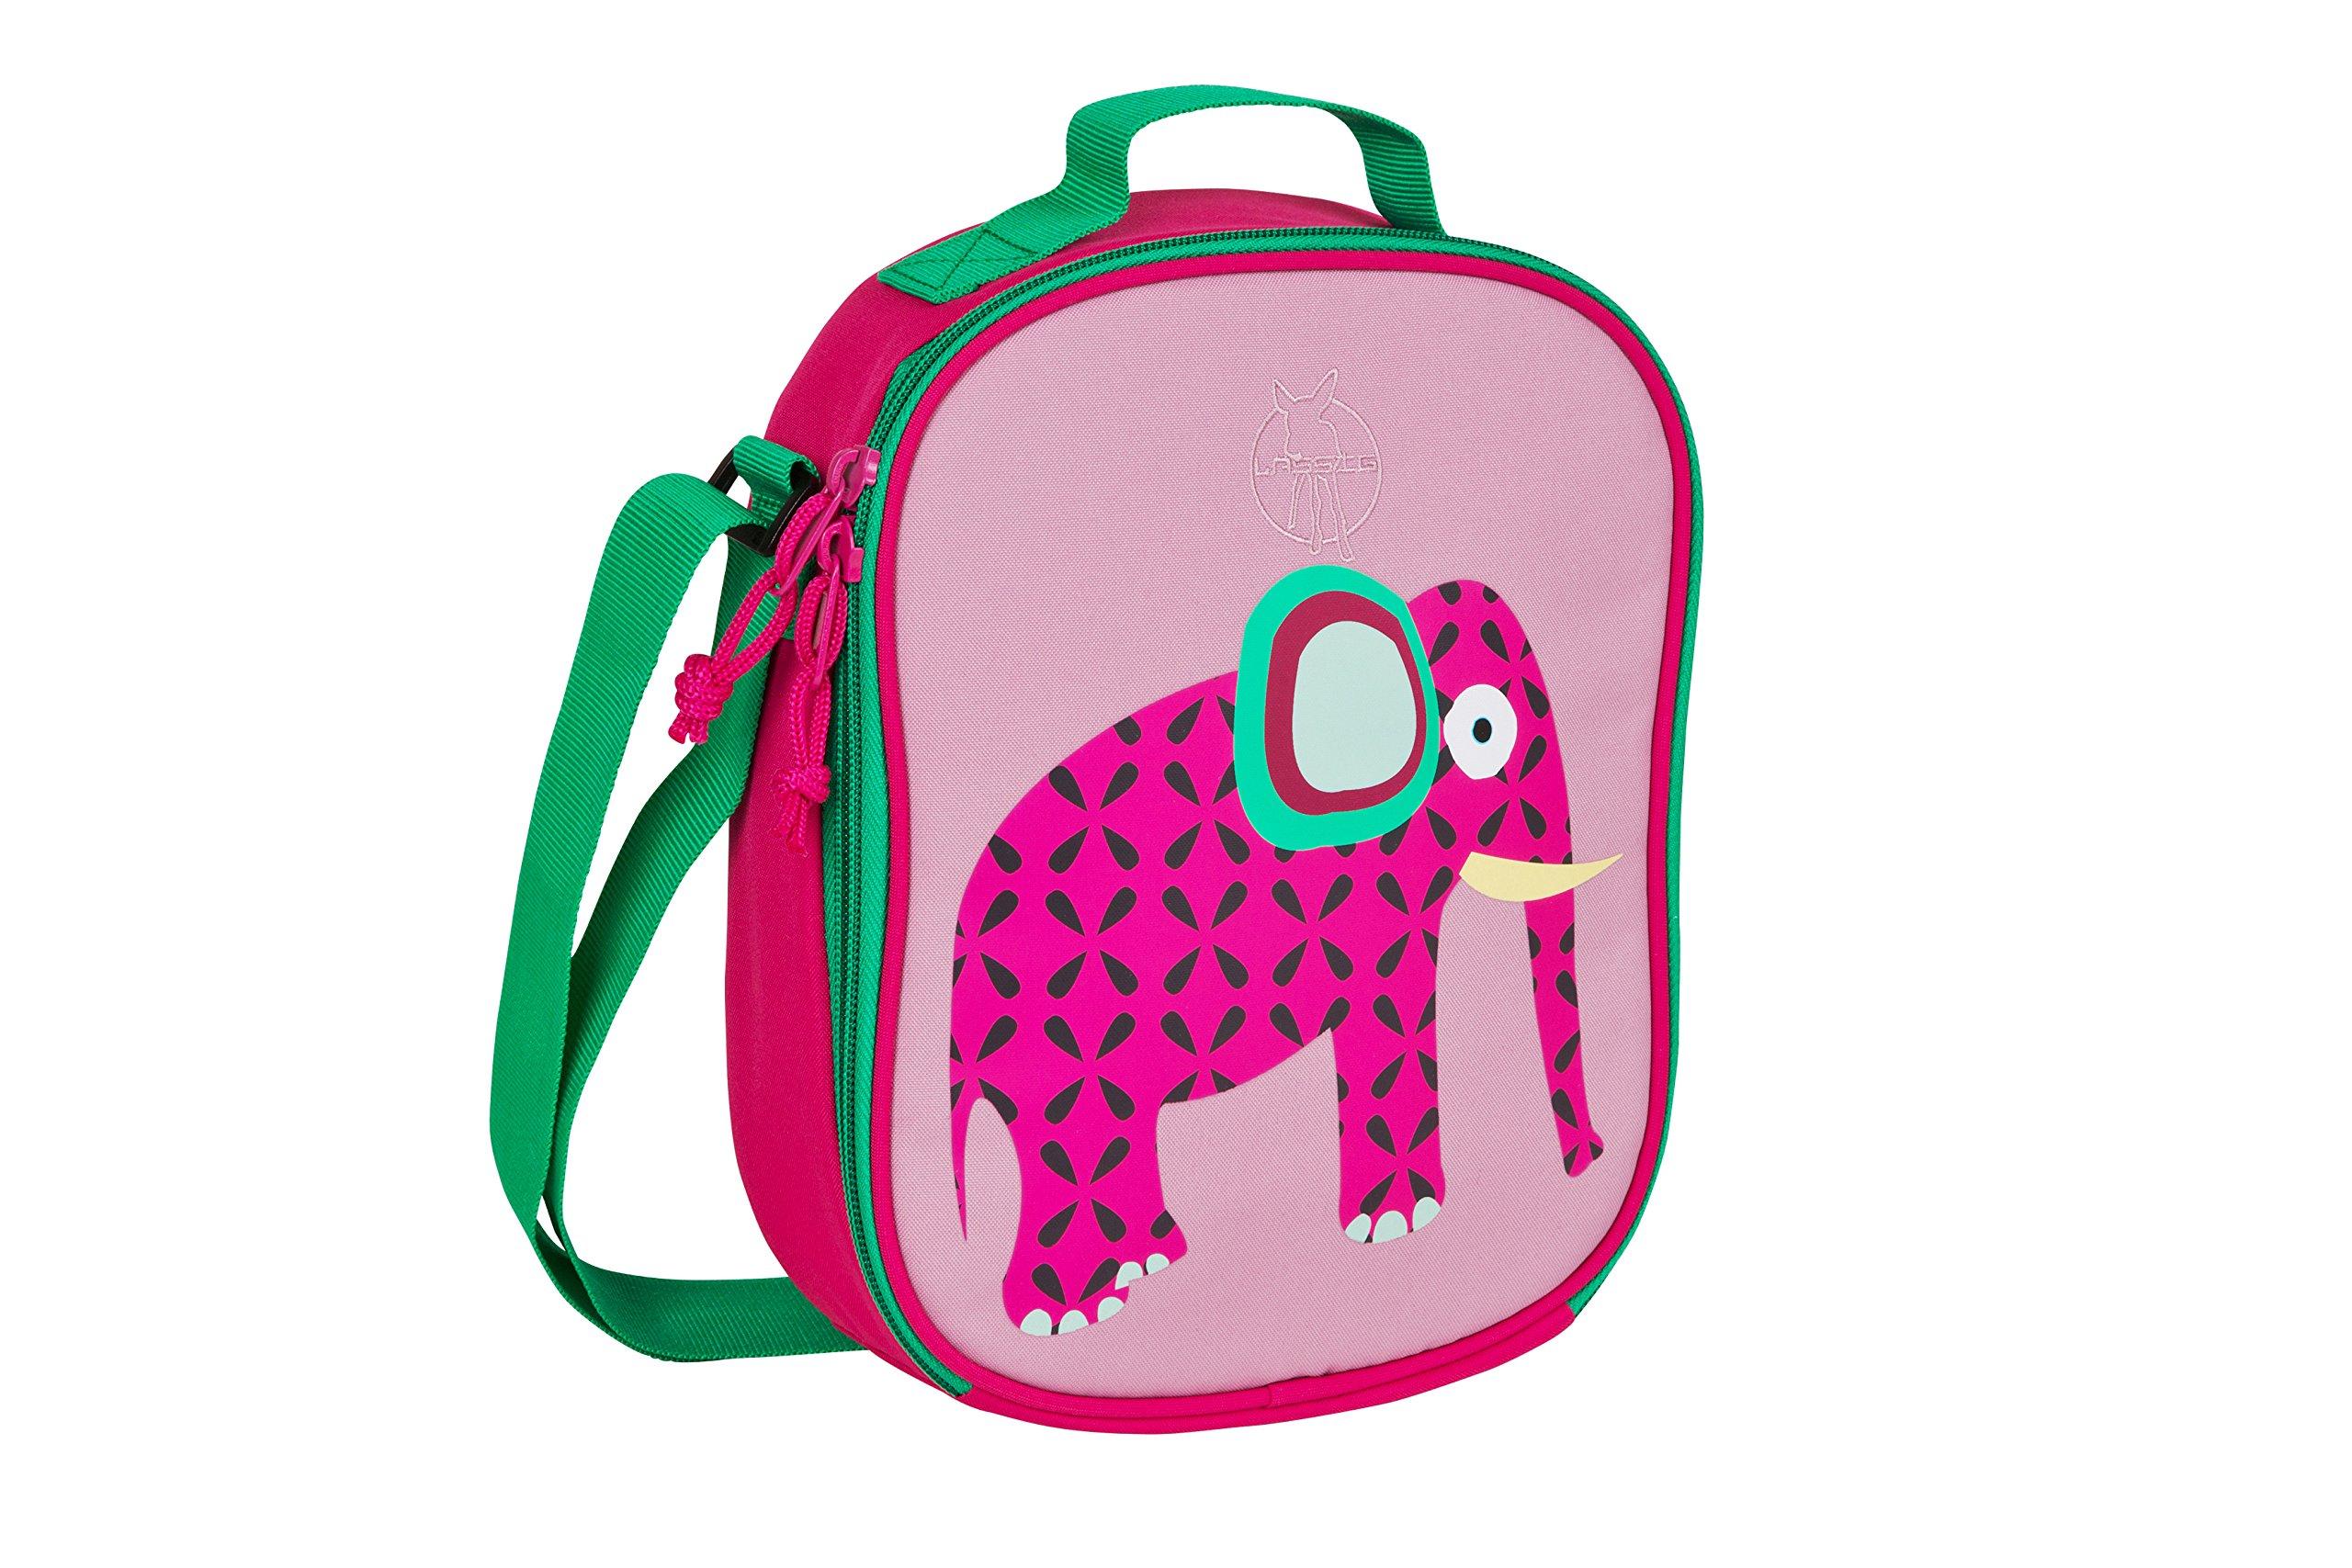 Lassig Kids Lunch Bag Wildlife Elephant